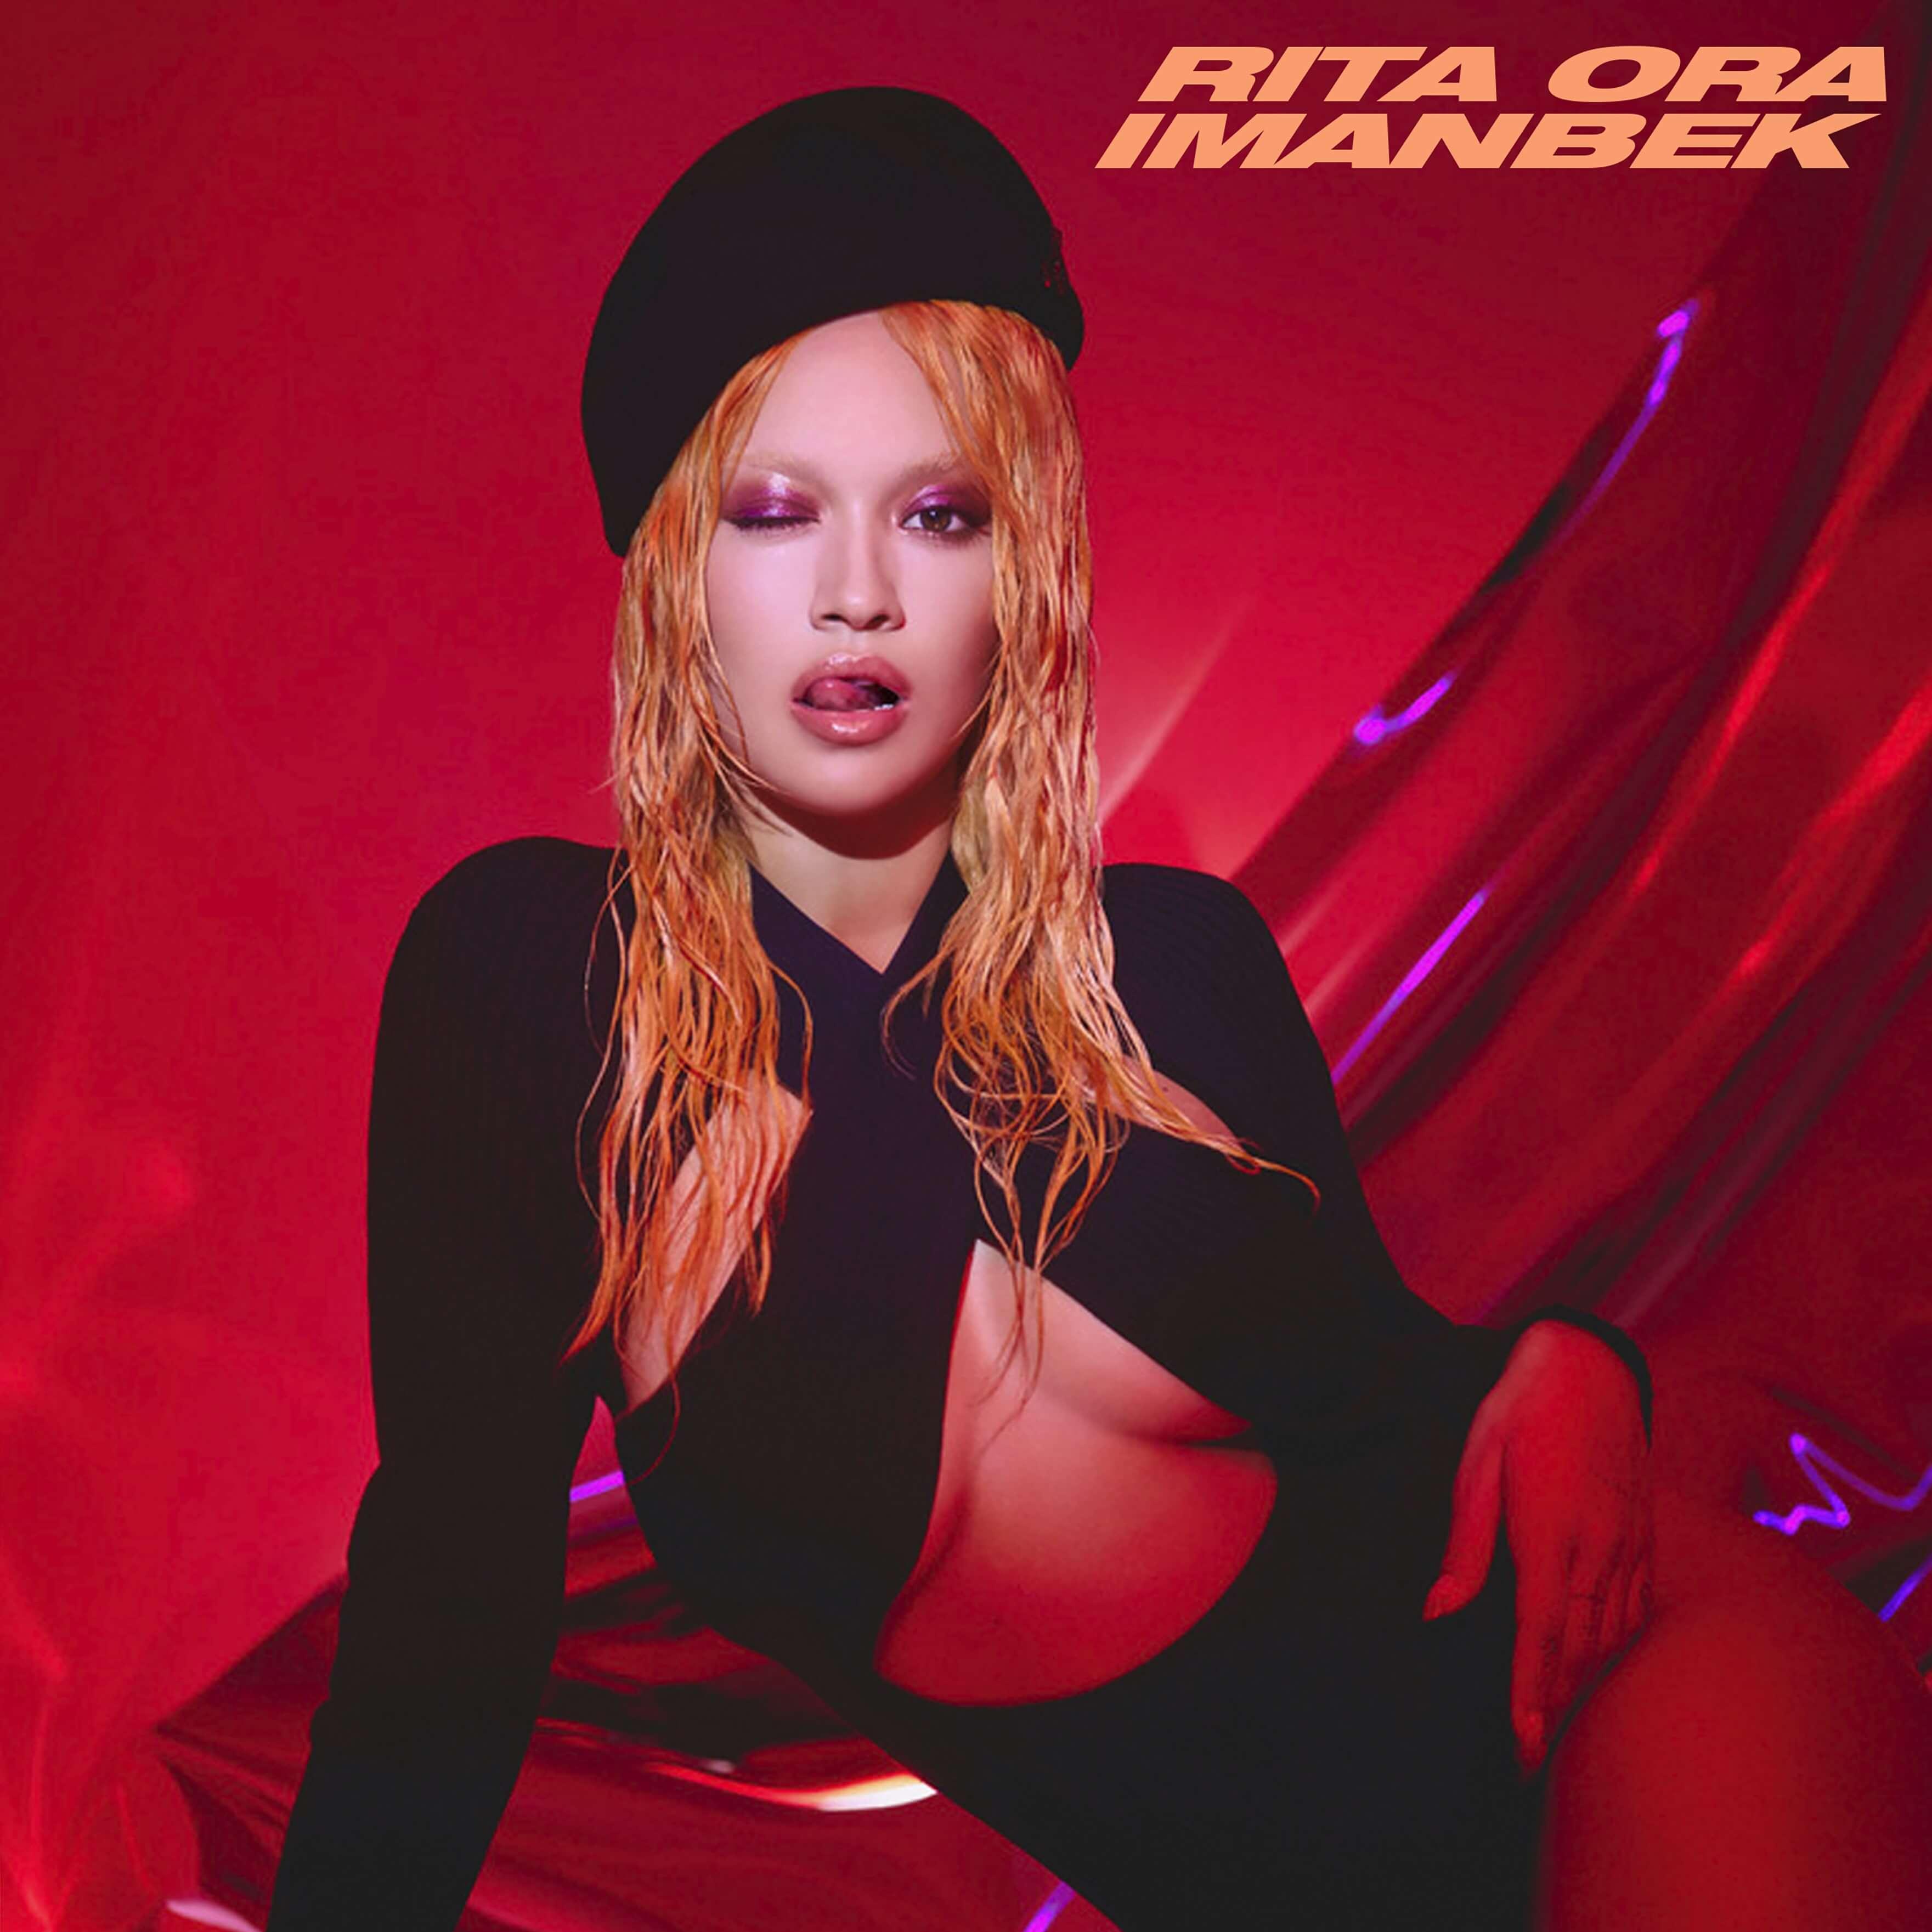 Rita Ora X Imanbek feat. David Guetta & Gunna - Big